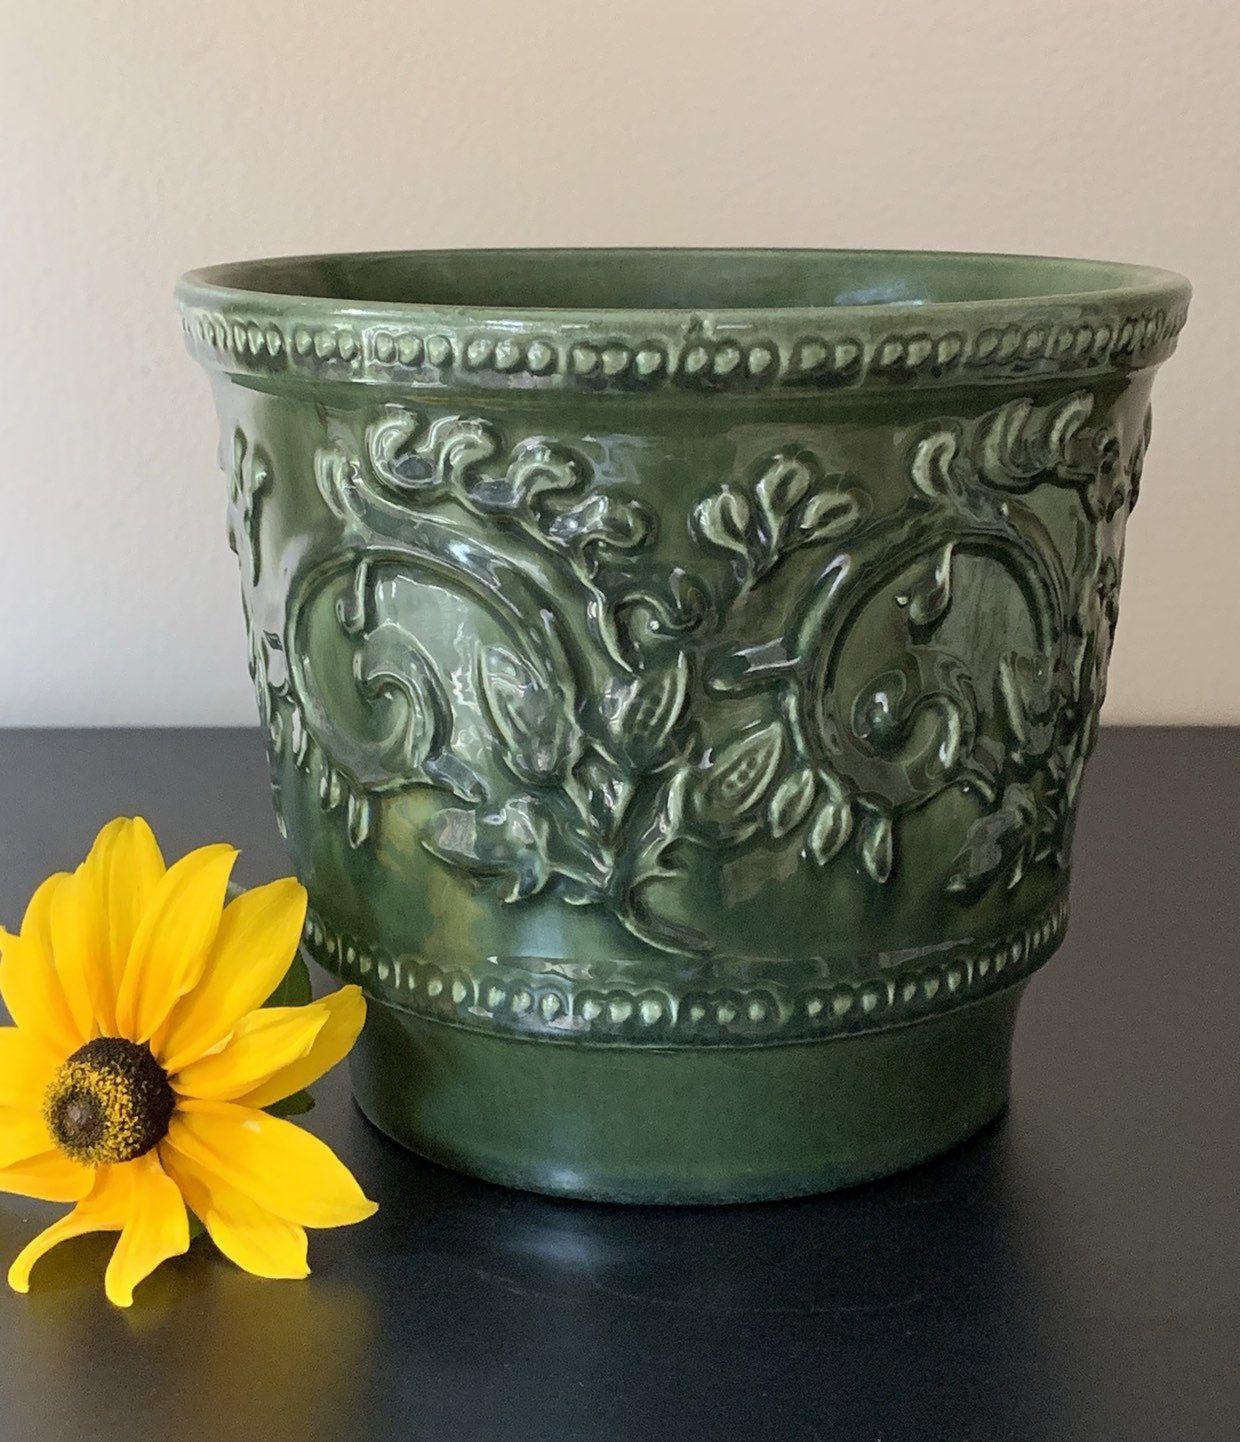 Large Vintage Green Floral Haeger Planter Pot Royal Haegar Green Flower Pots Pottery Planters Flower Pots